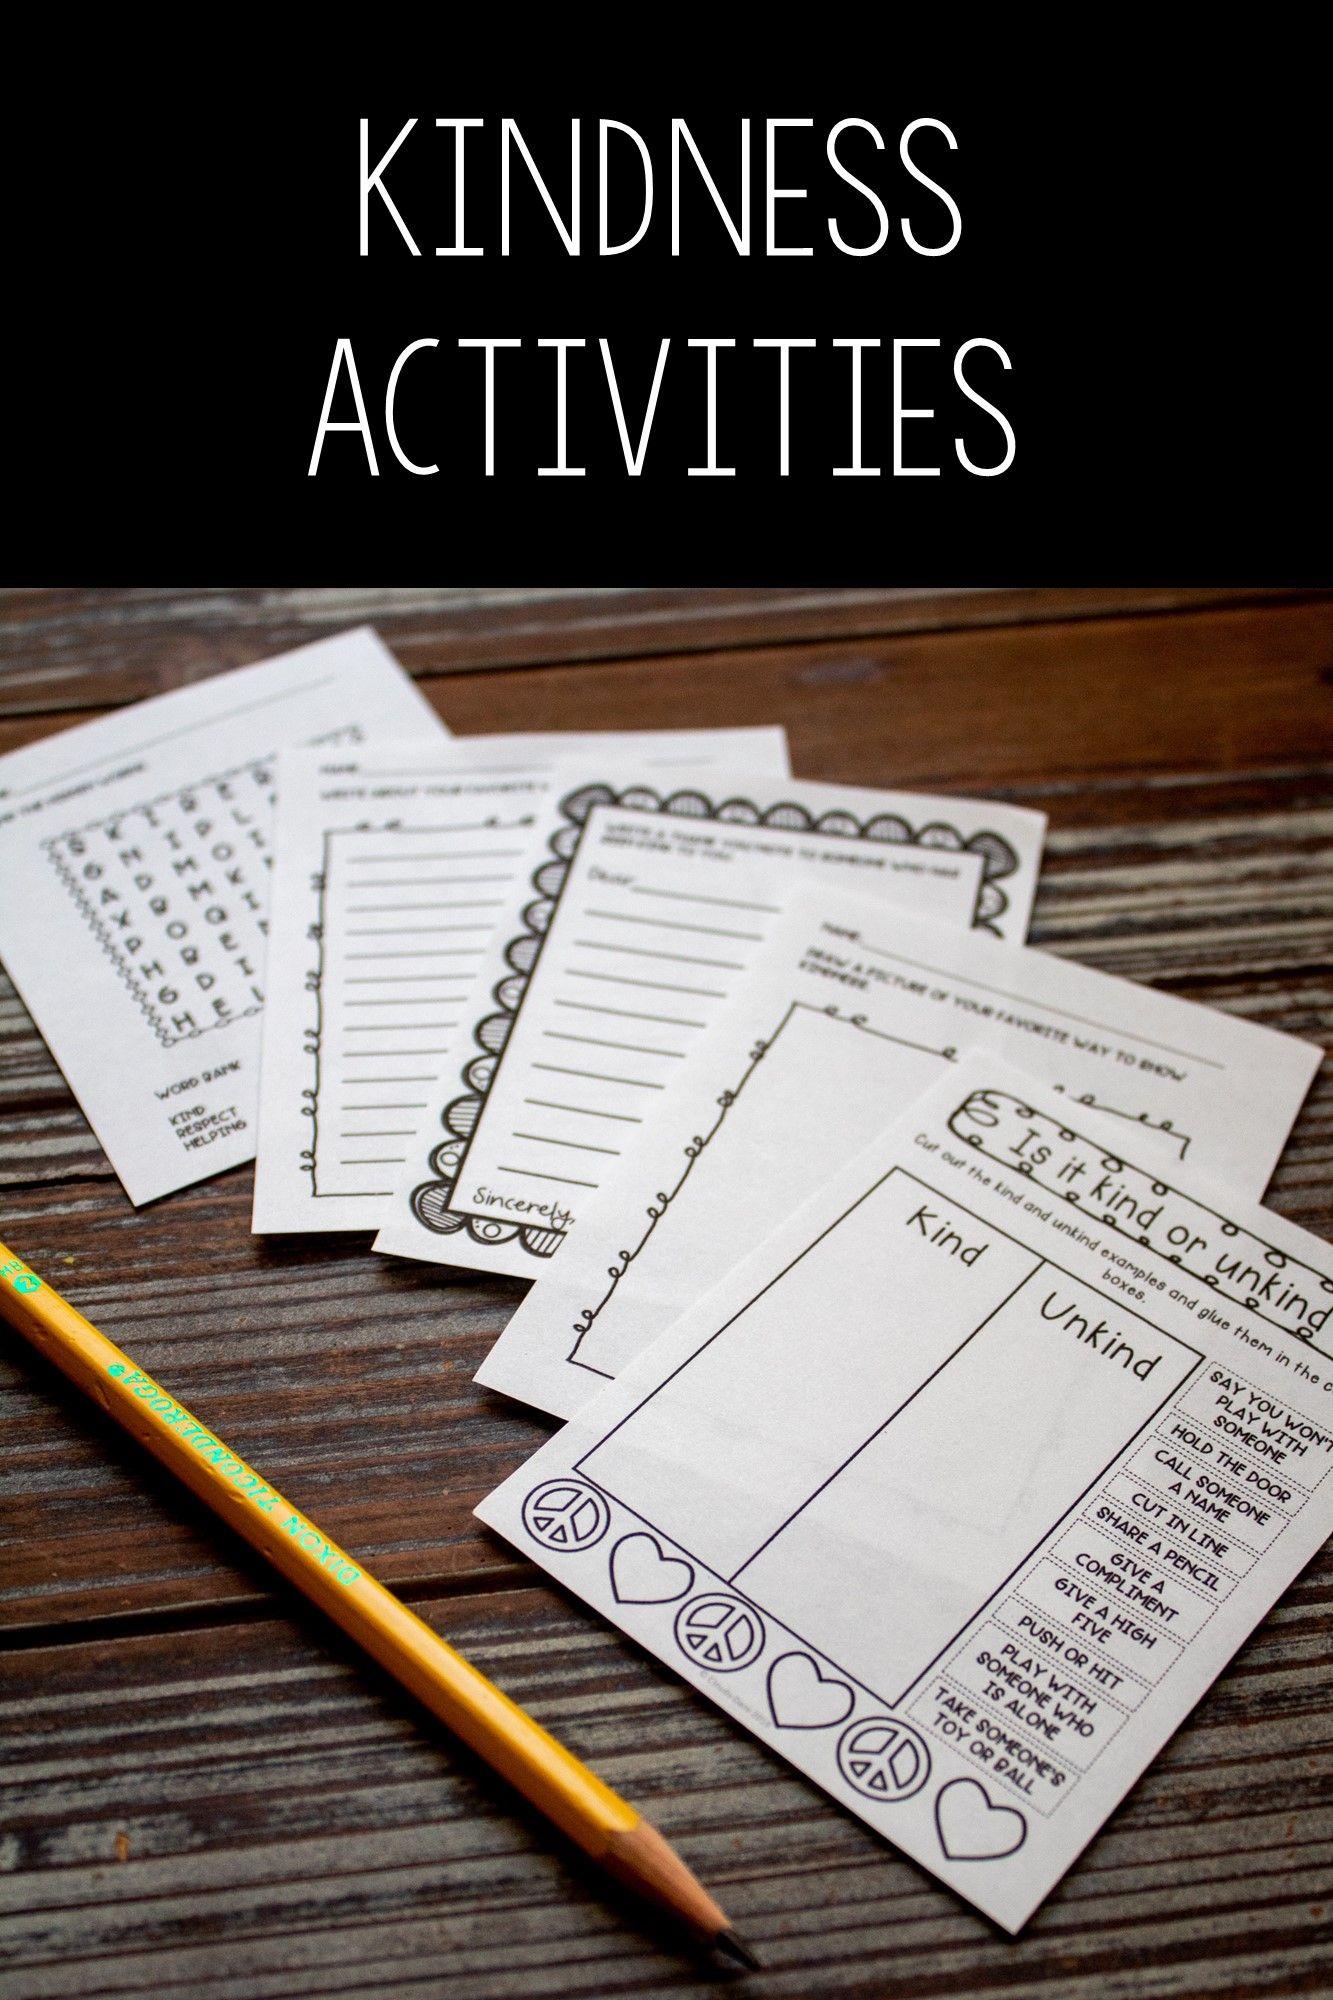 Kindness Activities In